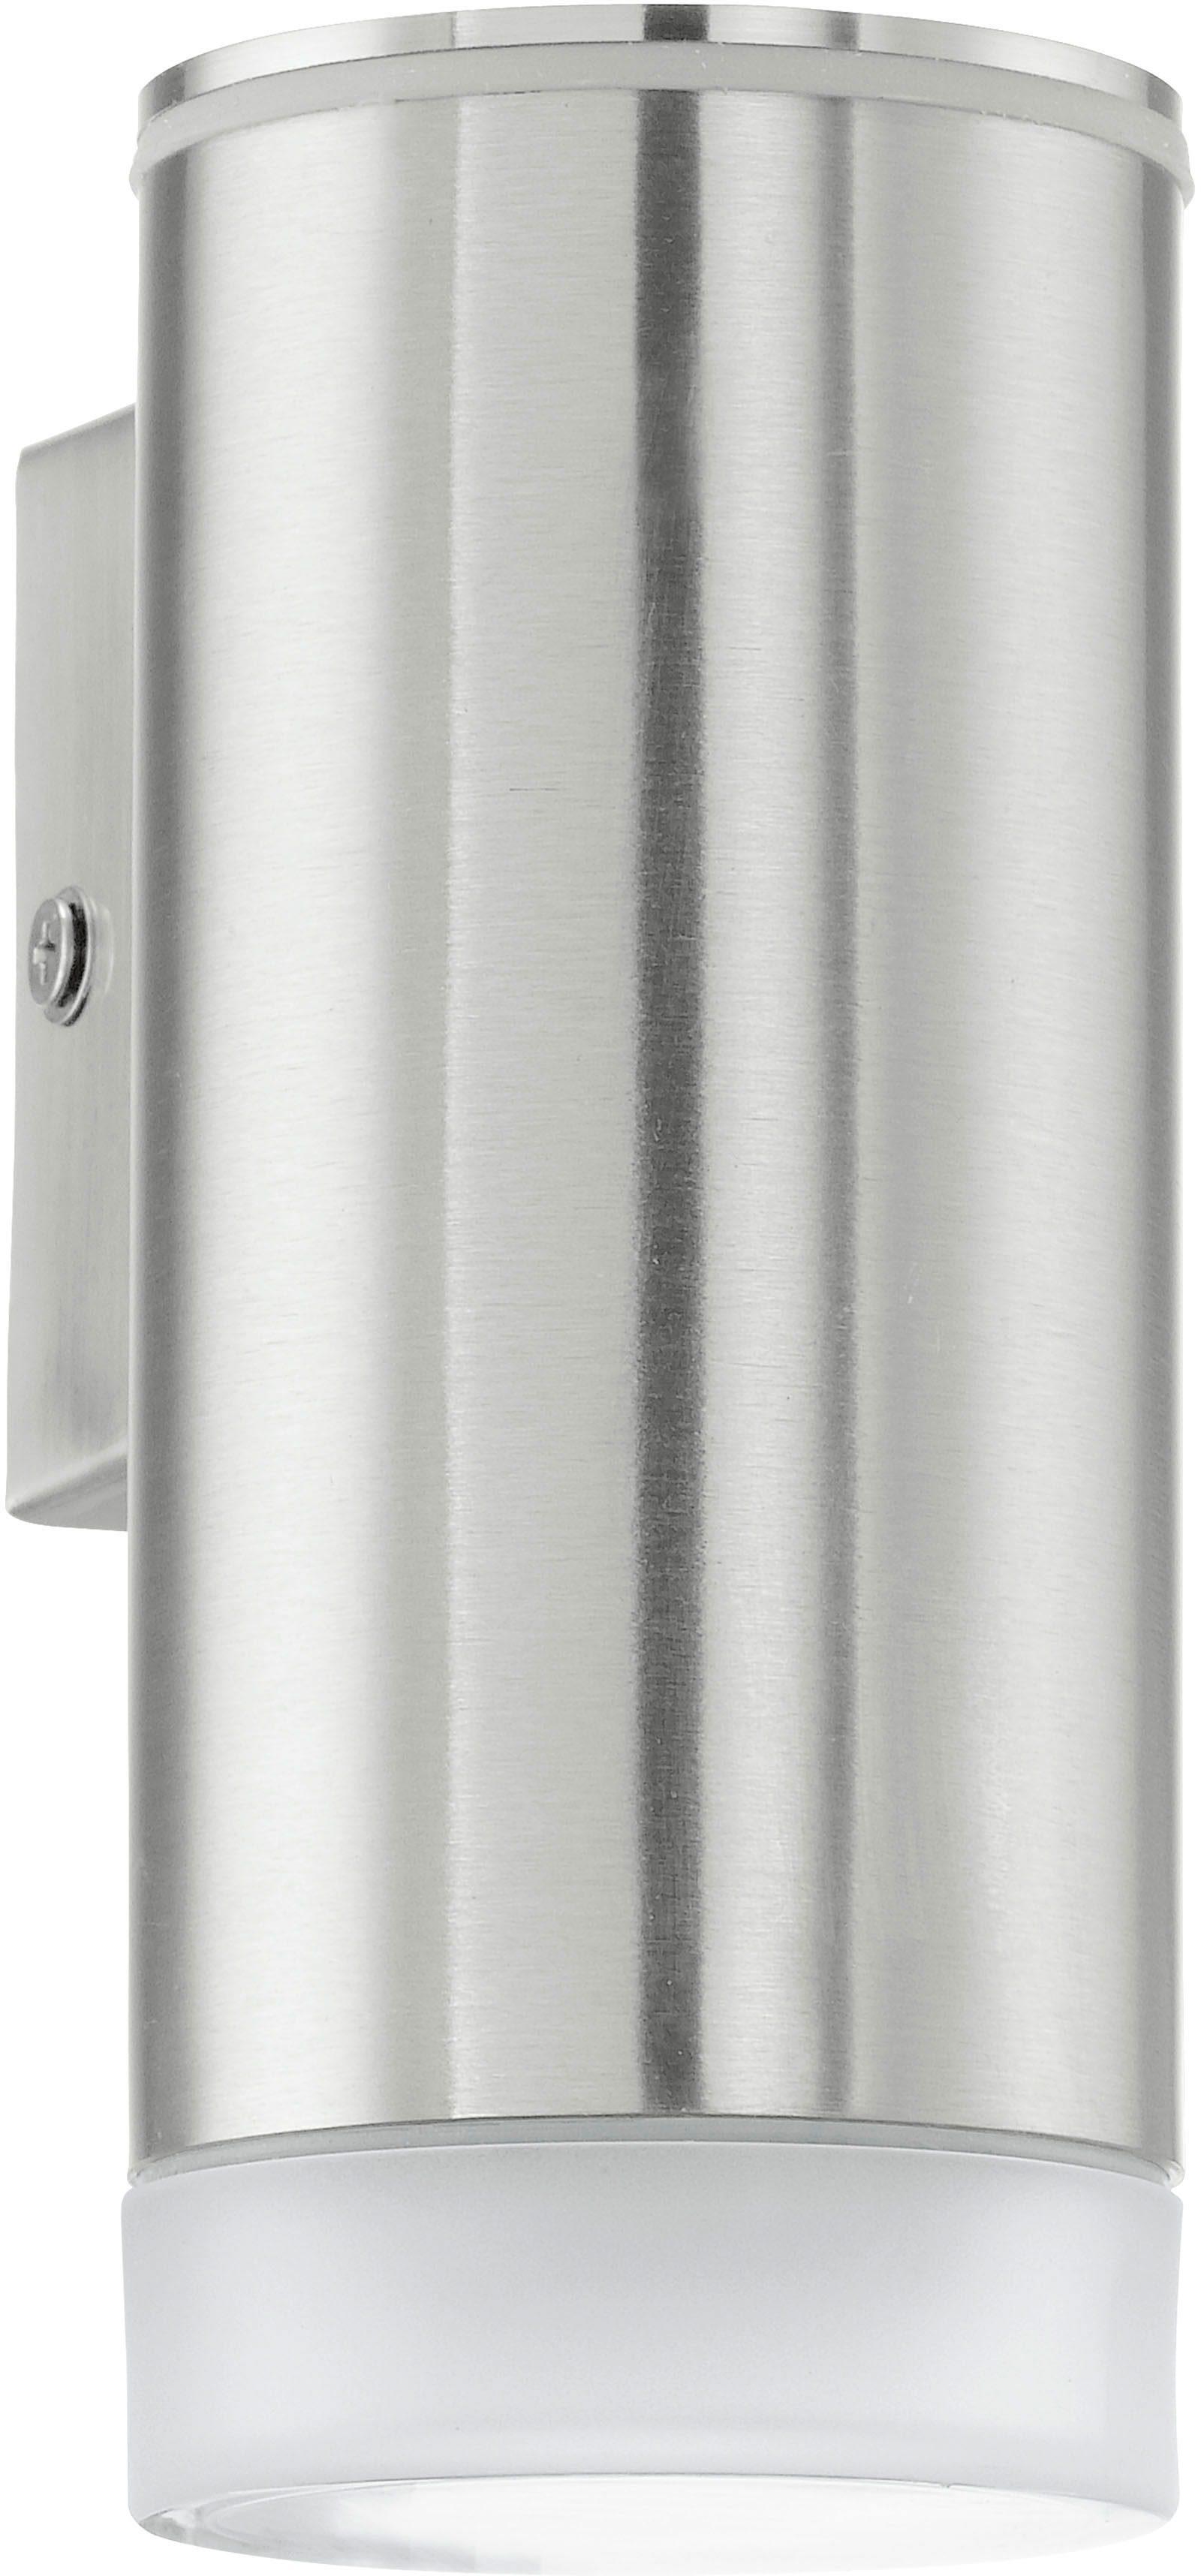 Eglo LED Außenleuchte, 1 flg., Wandleuchte, »RIGA-LED«